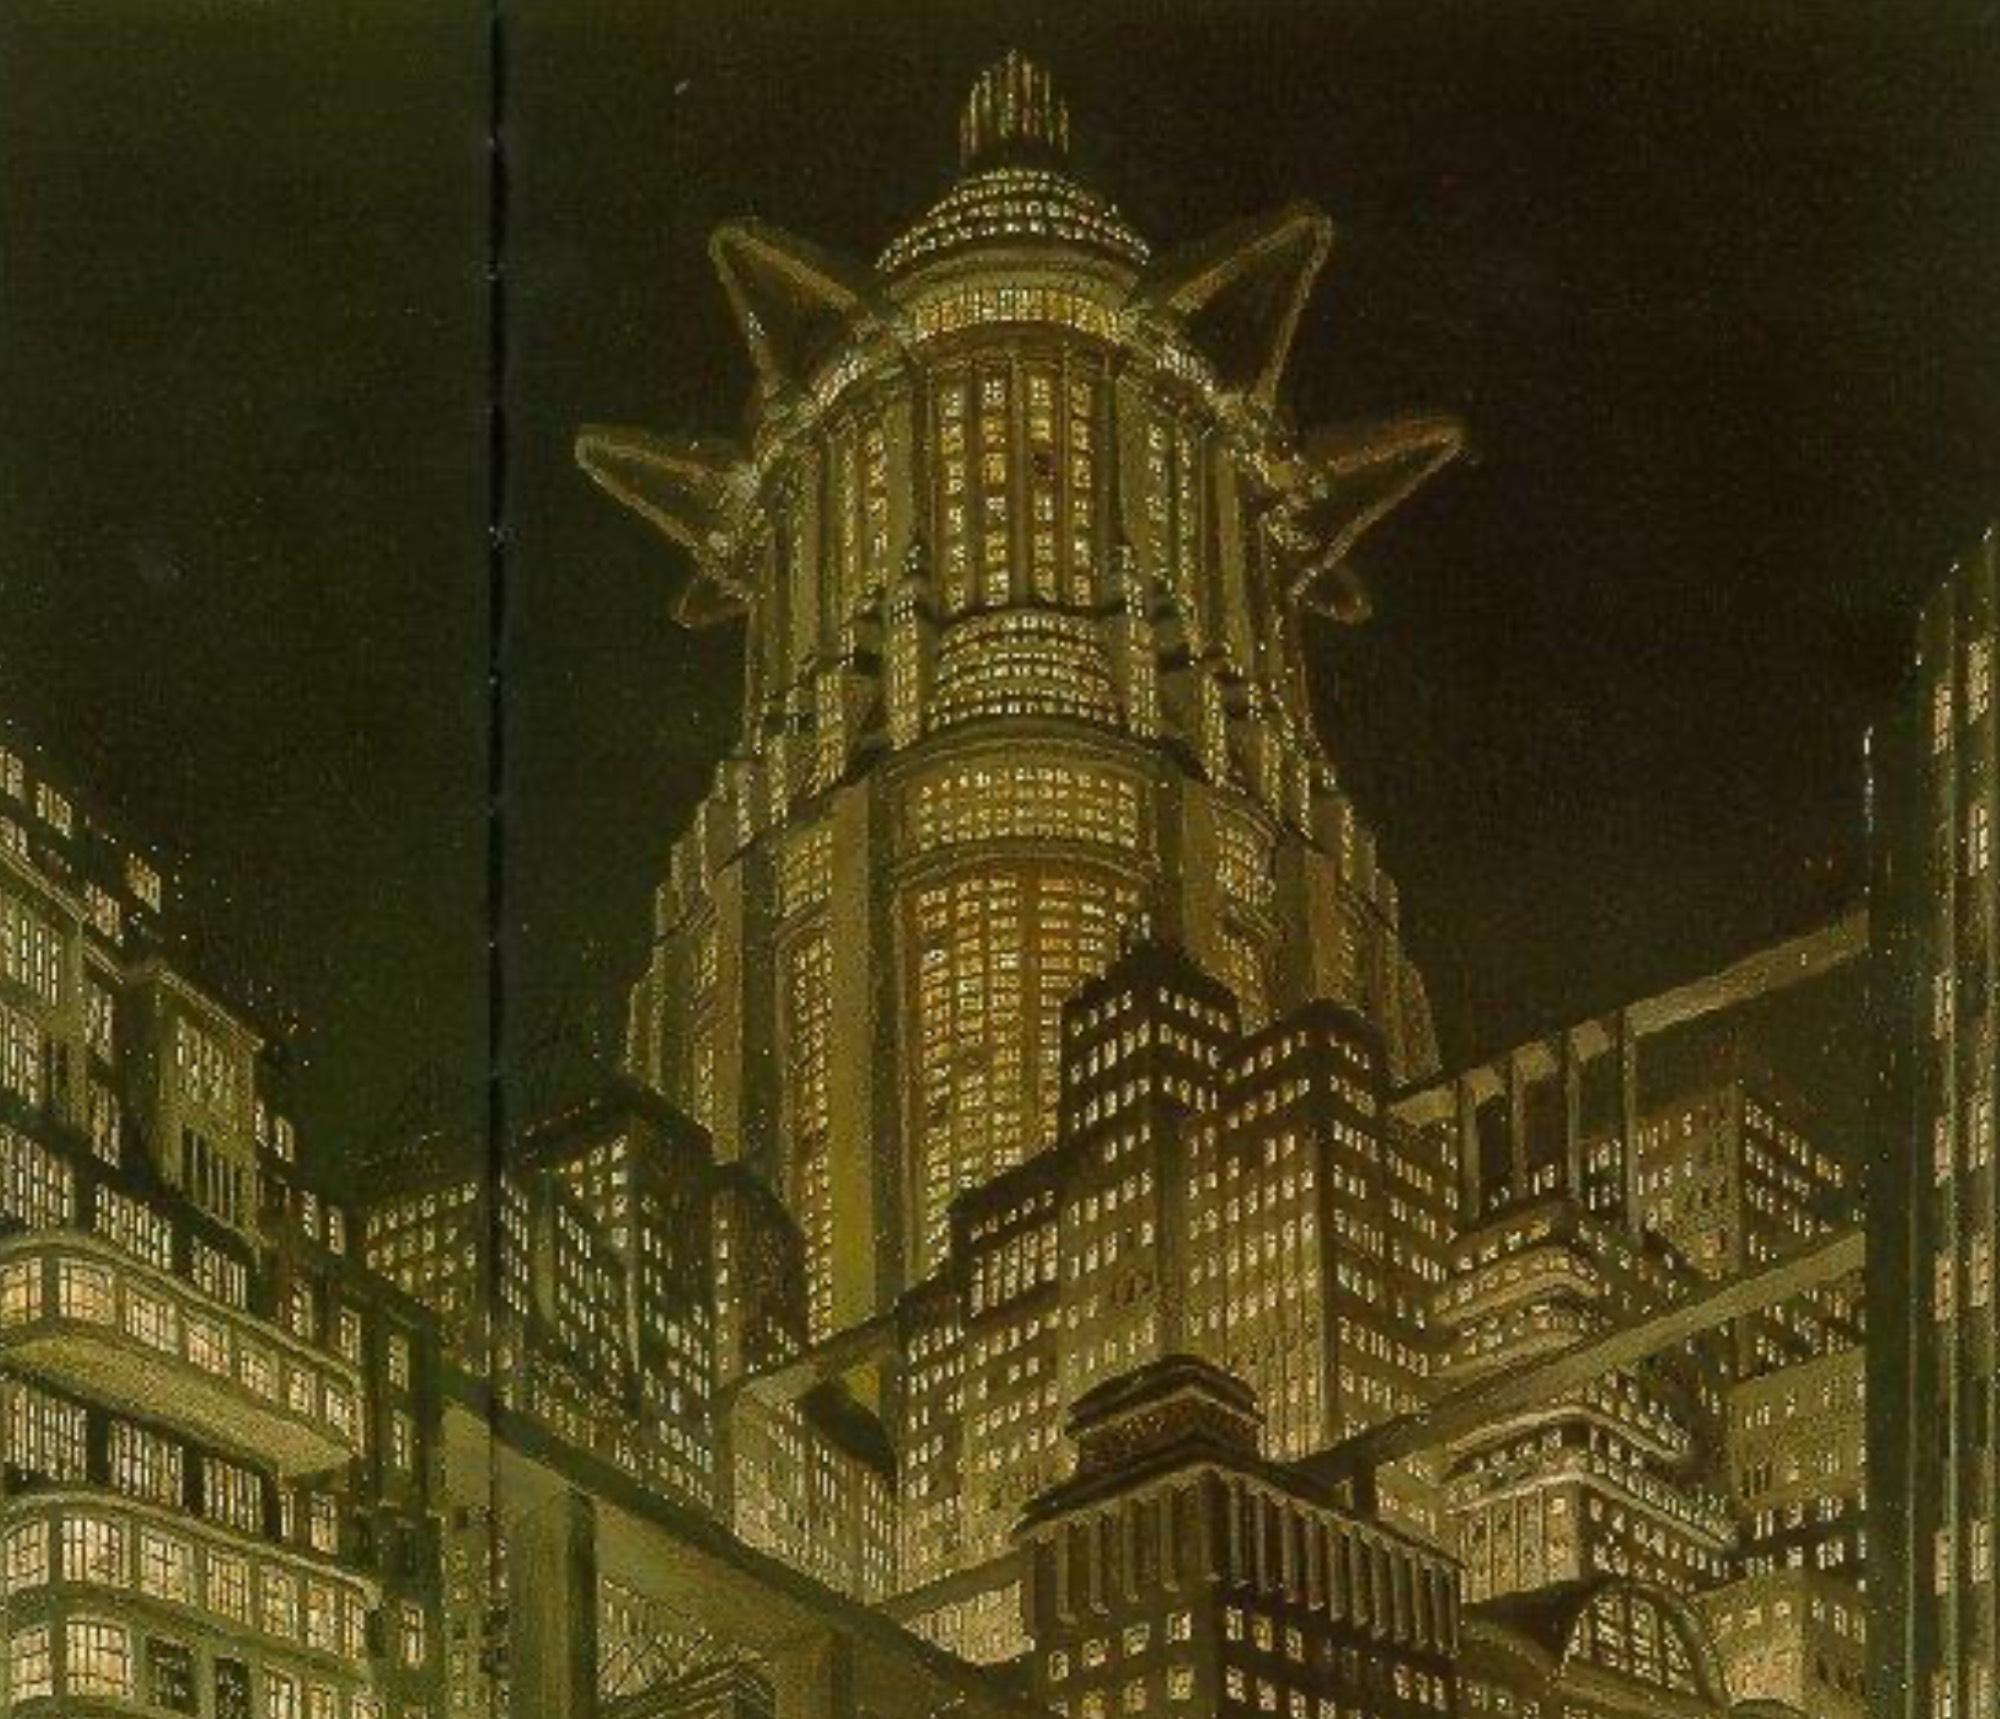 Expressionist Dystopia: Metropolis (1927)